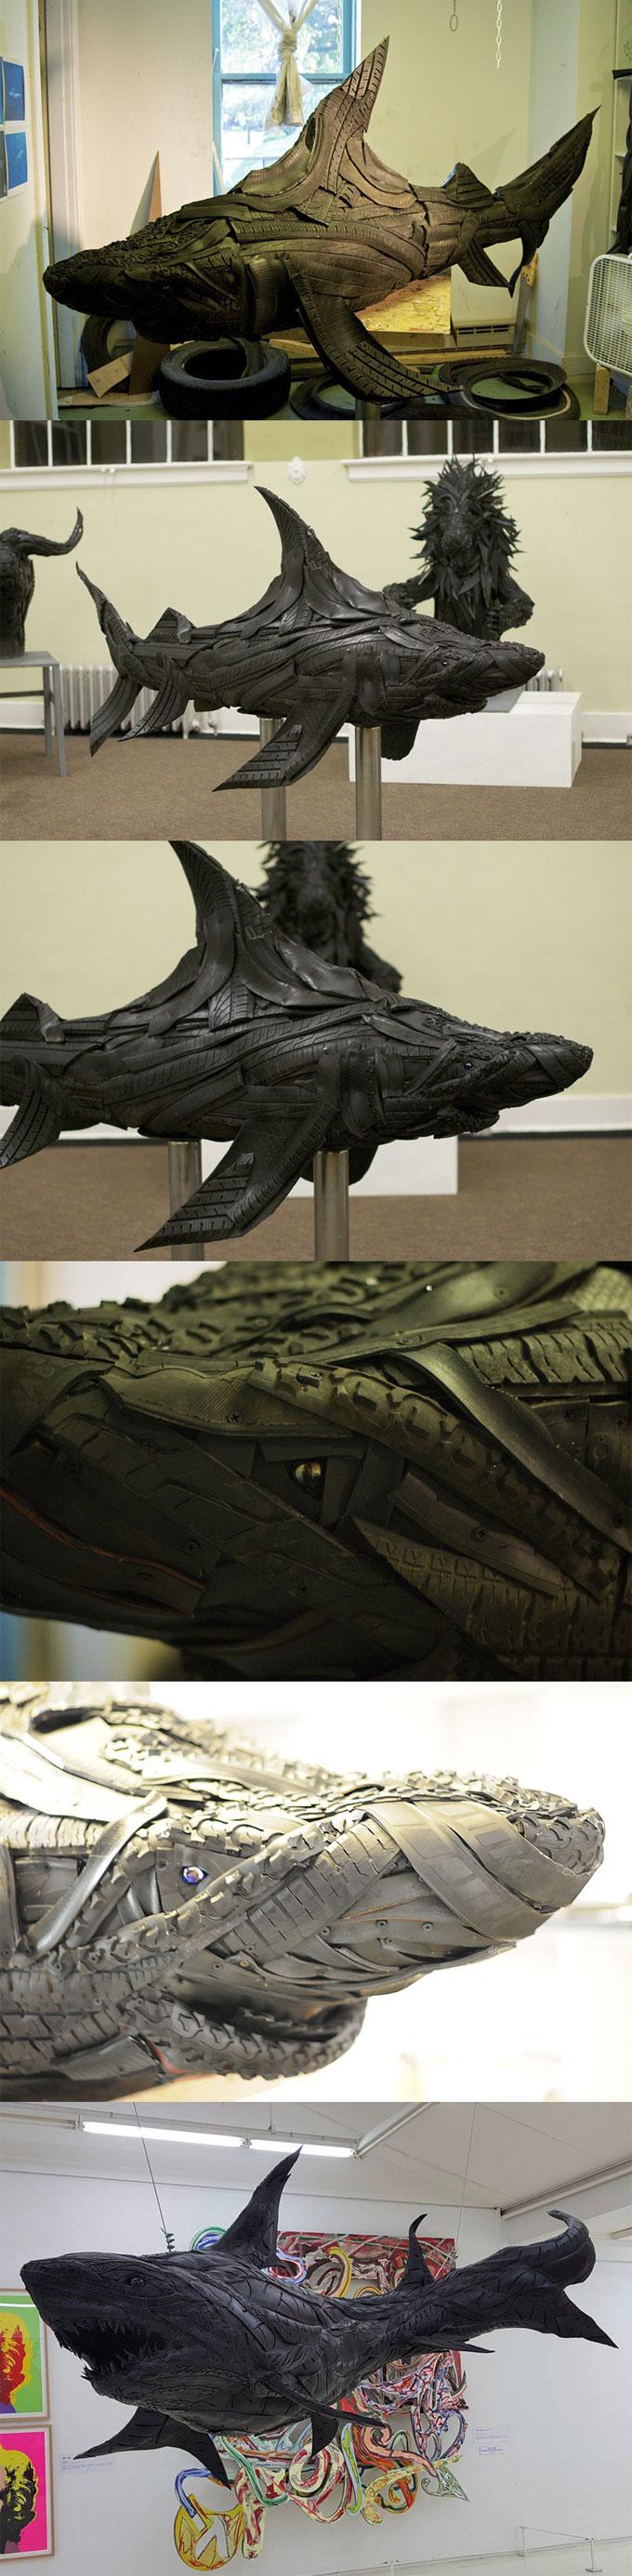 Арт-скульптуры акулы из автомобильных шин